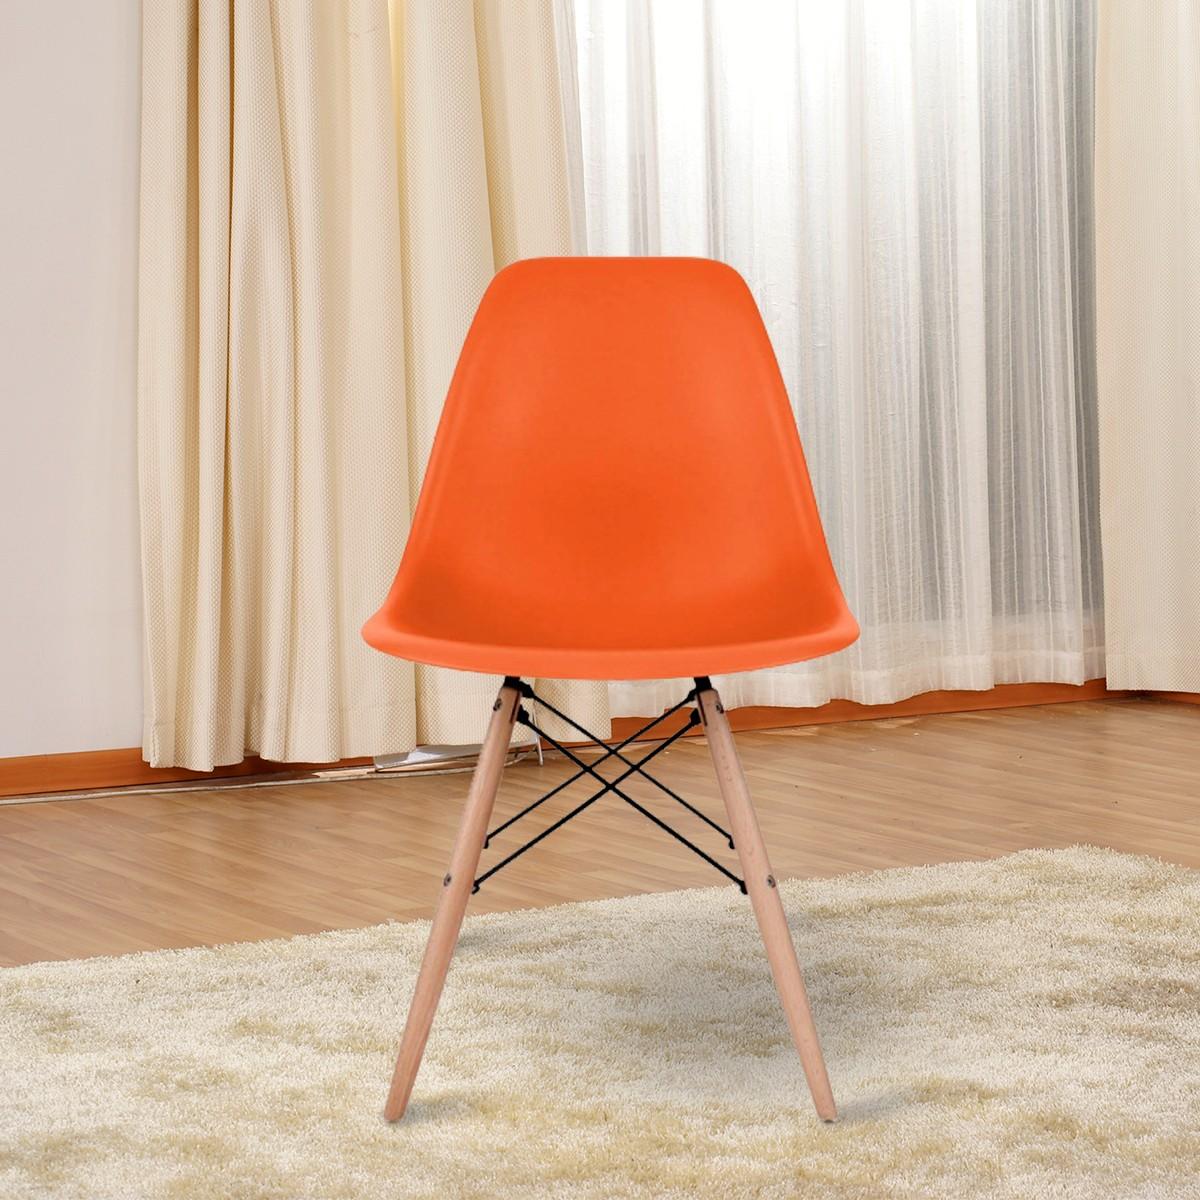 Molded Plastic Chair in Orange with Wood Legs (T811E006-OG)